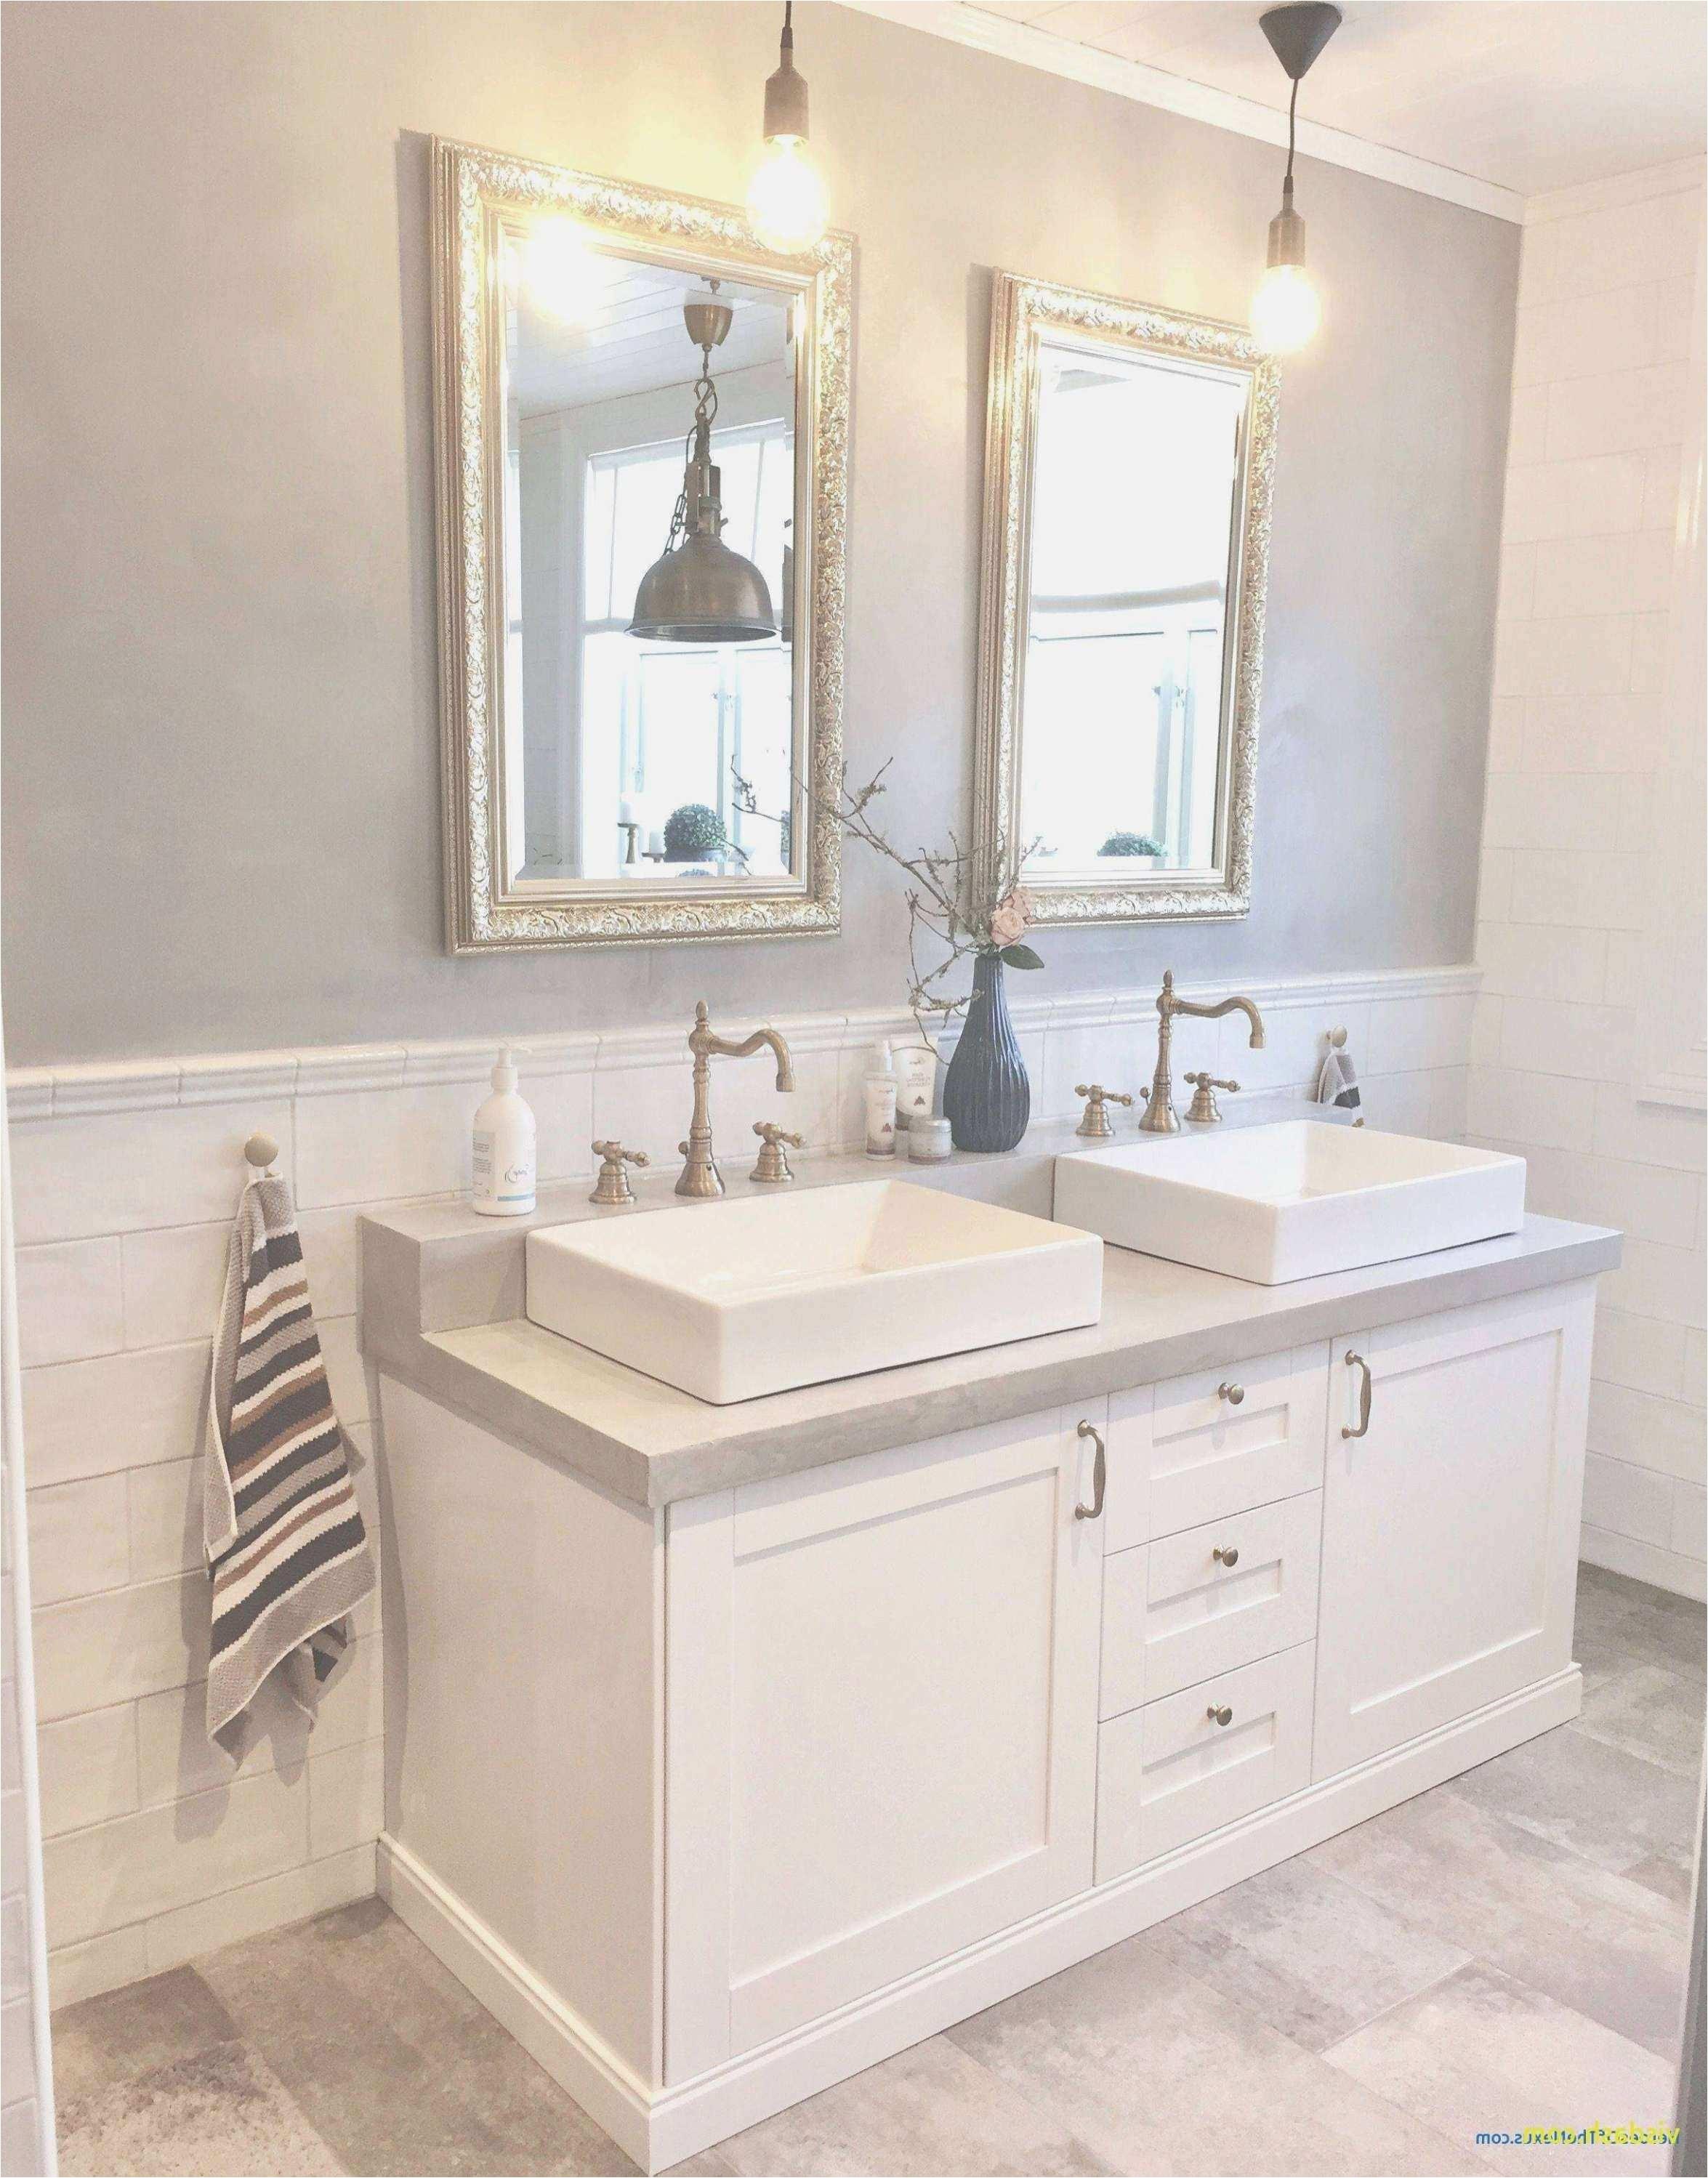 Traditional Bathroom Vanity Units Inspirational top 25 Fresh Typical Bathroom Vanity Size Bathroom Designs Ideas